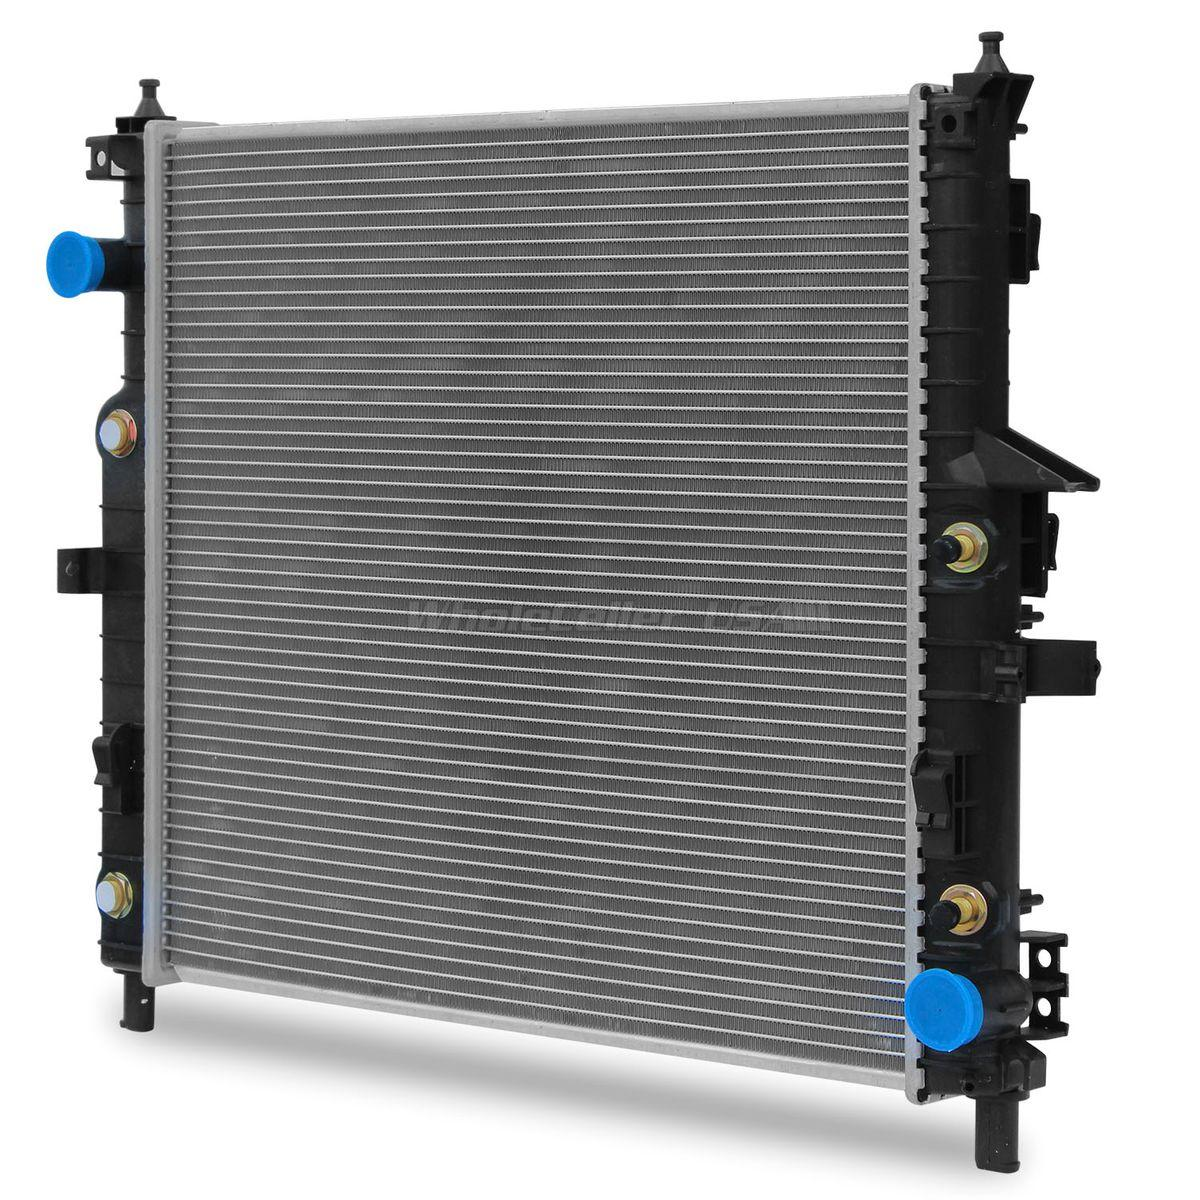 Radiator 2190 32mm core for 2002 2003 2004 2005 mercedes for Mercedes benz radiator